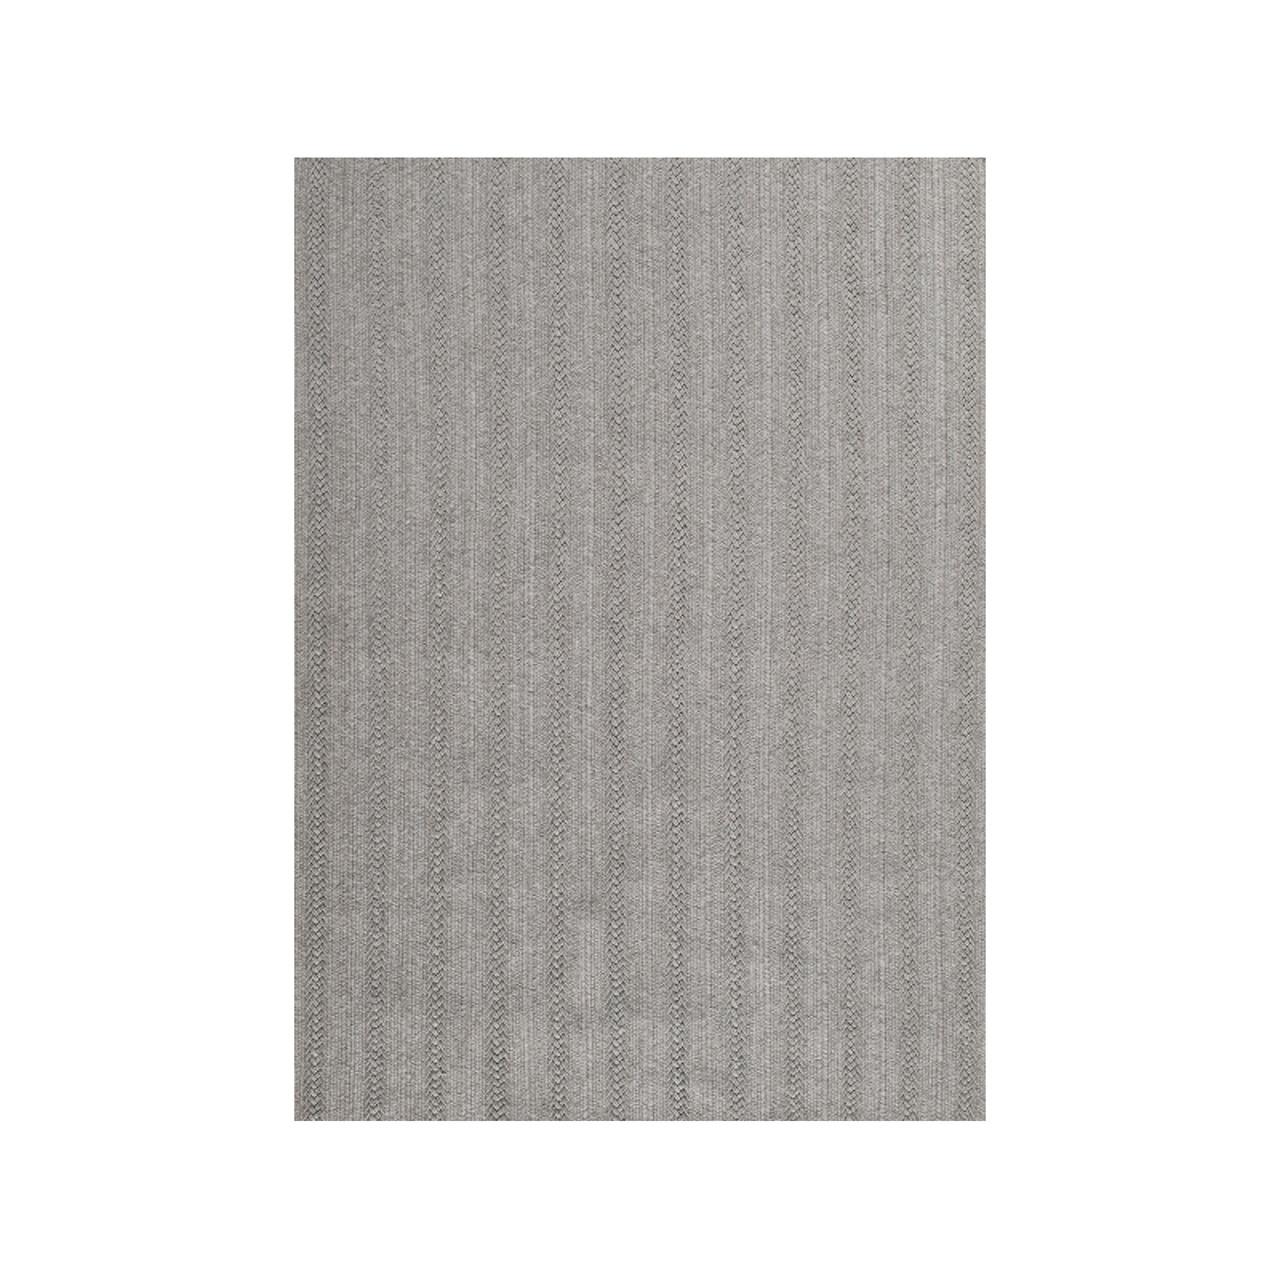 Toulemonde Bochart  Aussenteppich 'Torsade' Grau, 170 x 240 cm